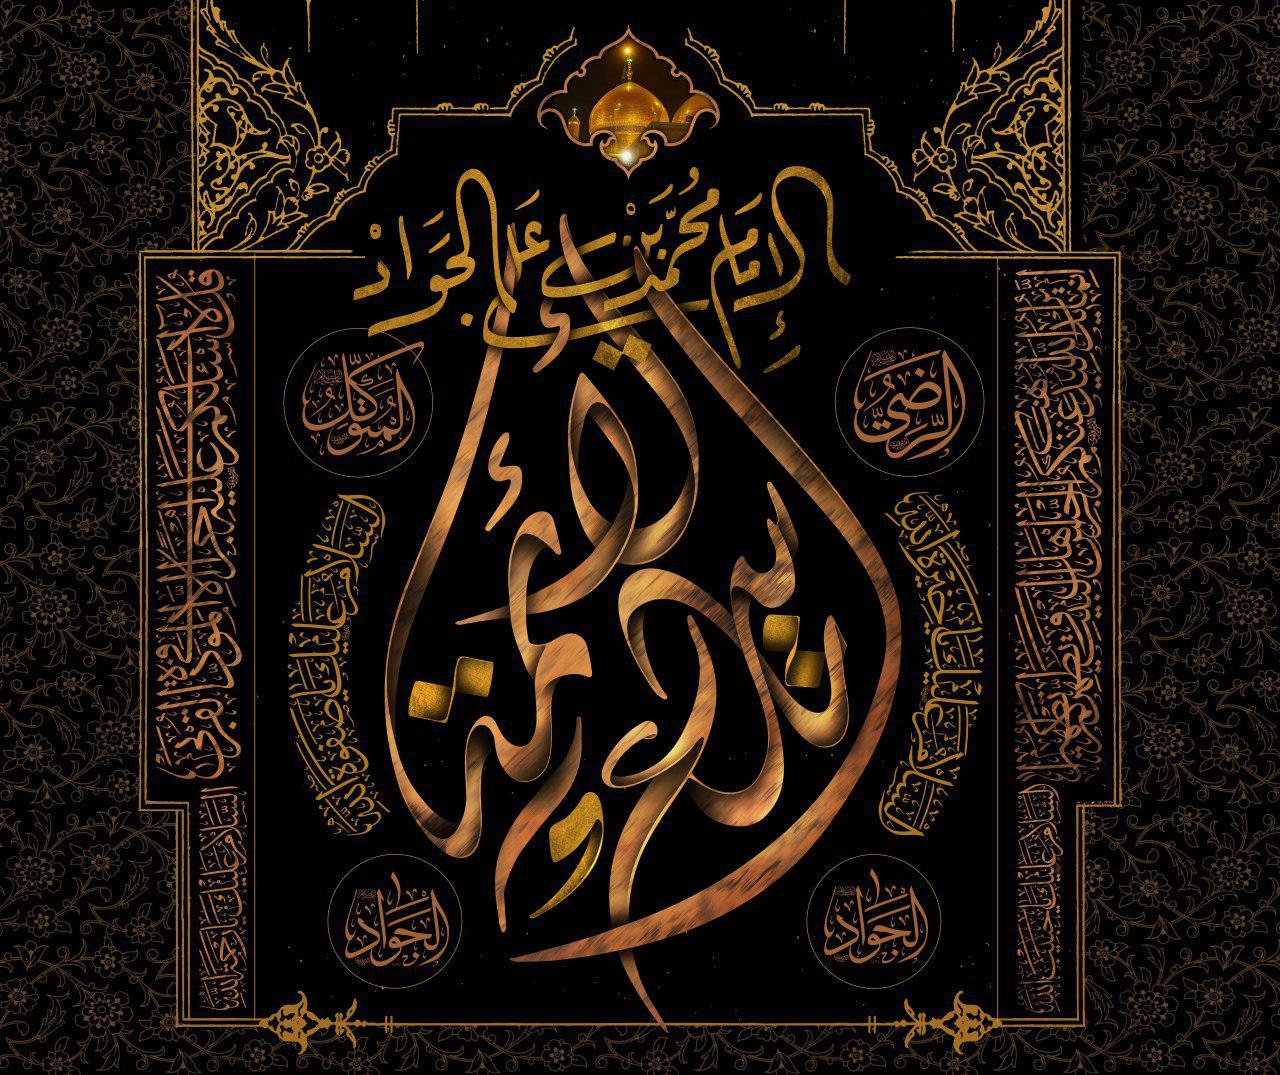 پوستر شهادت امام جواد (ع)  03